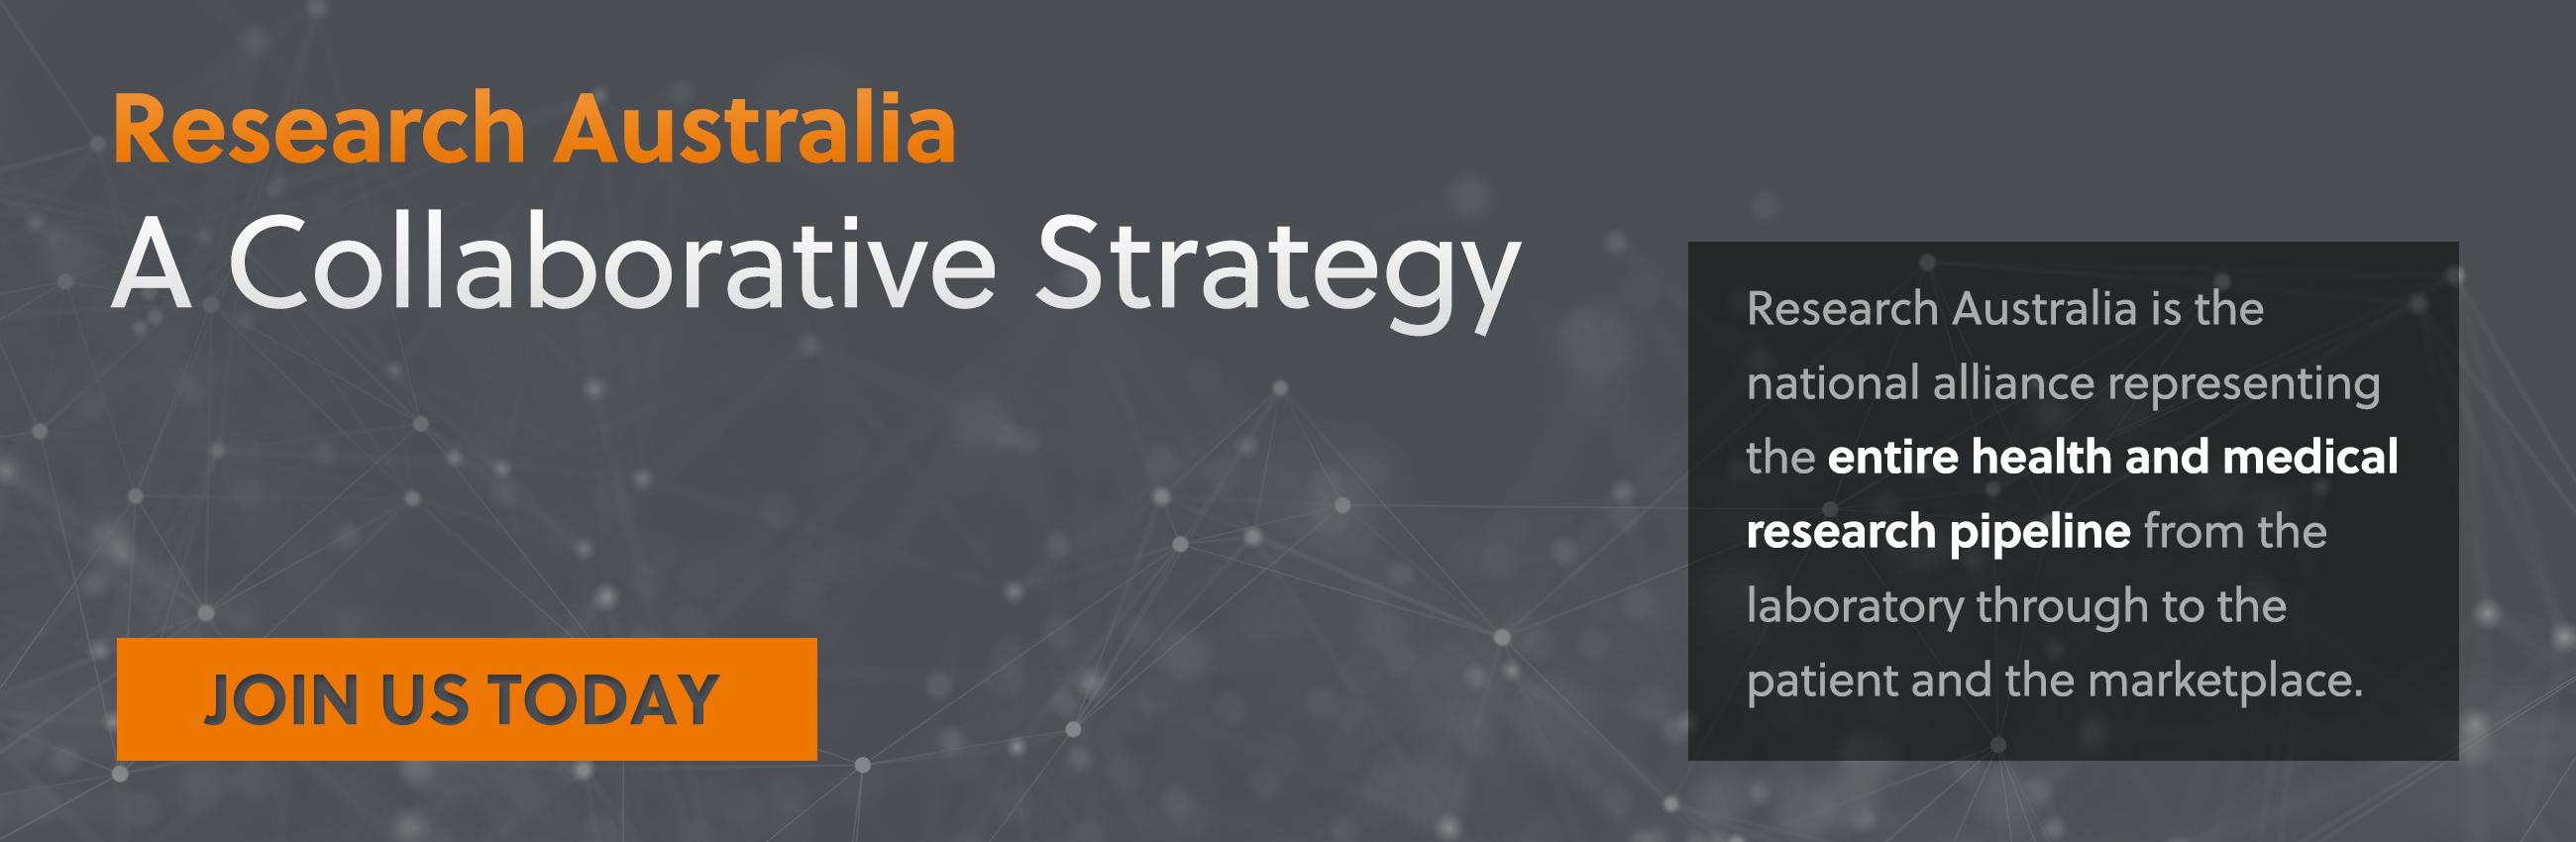 A Collaborative Strategy